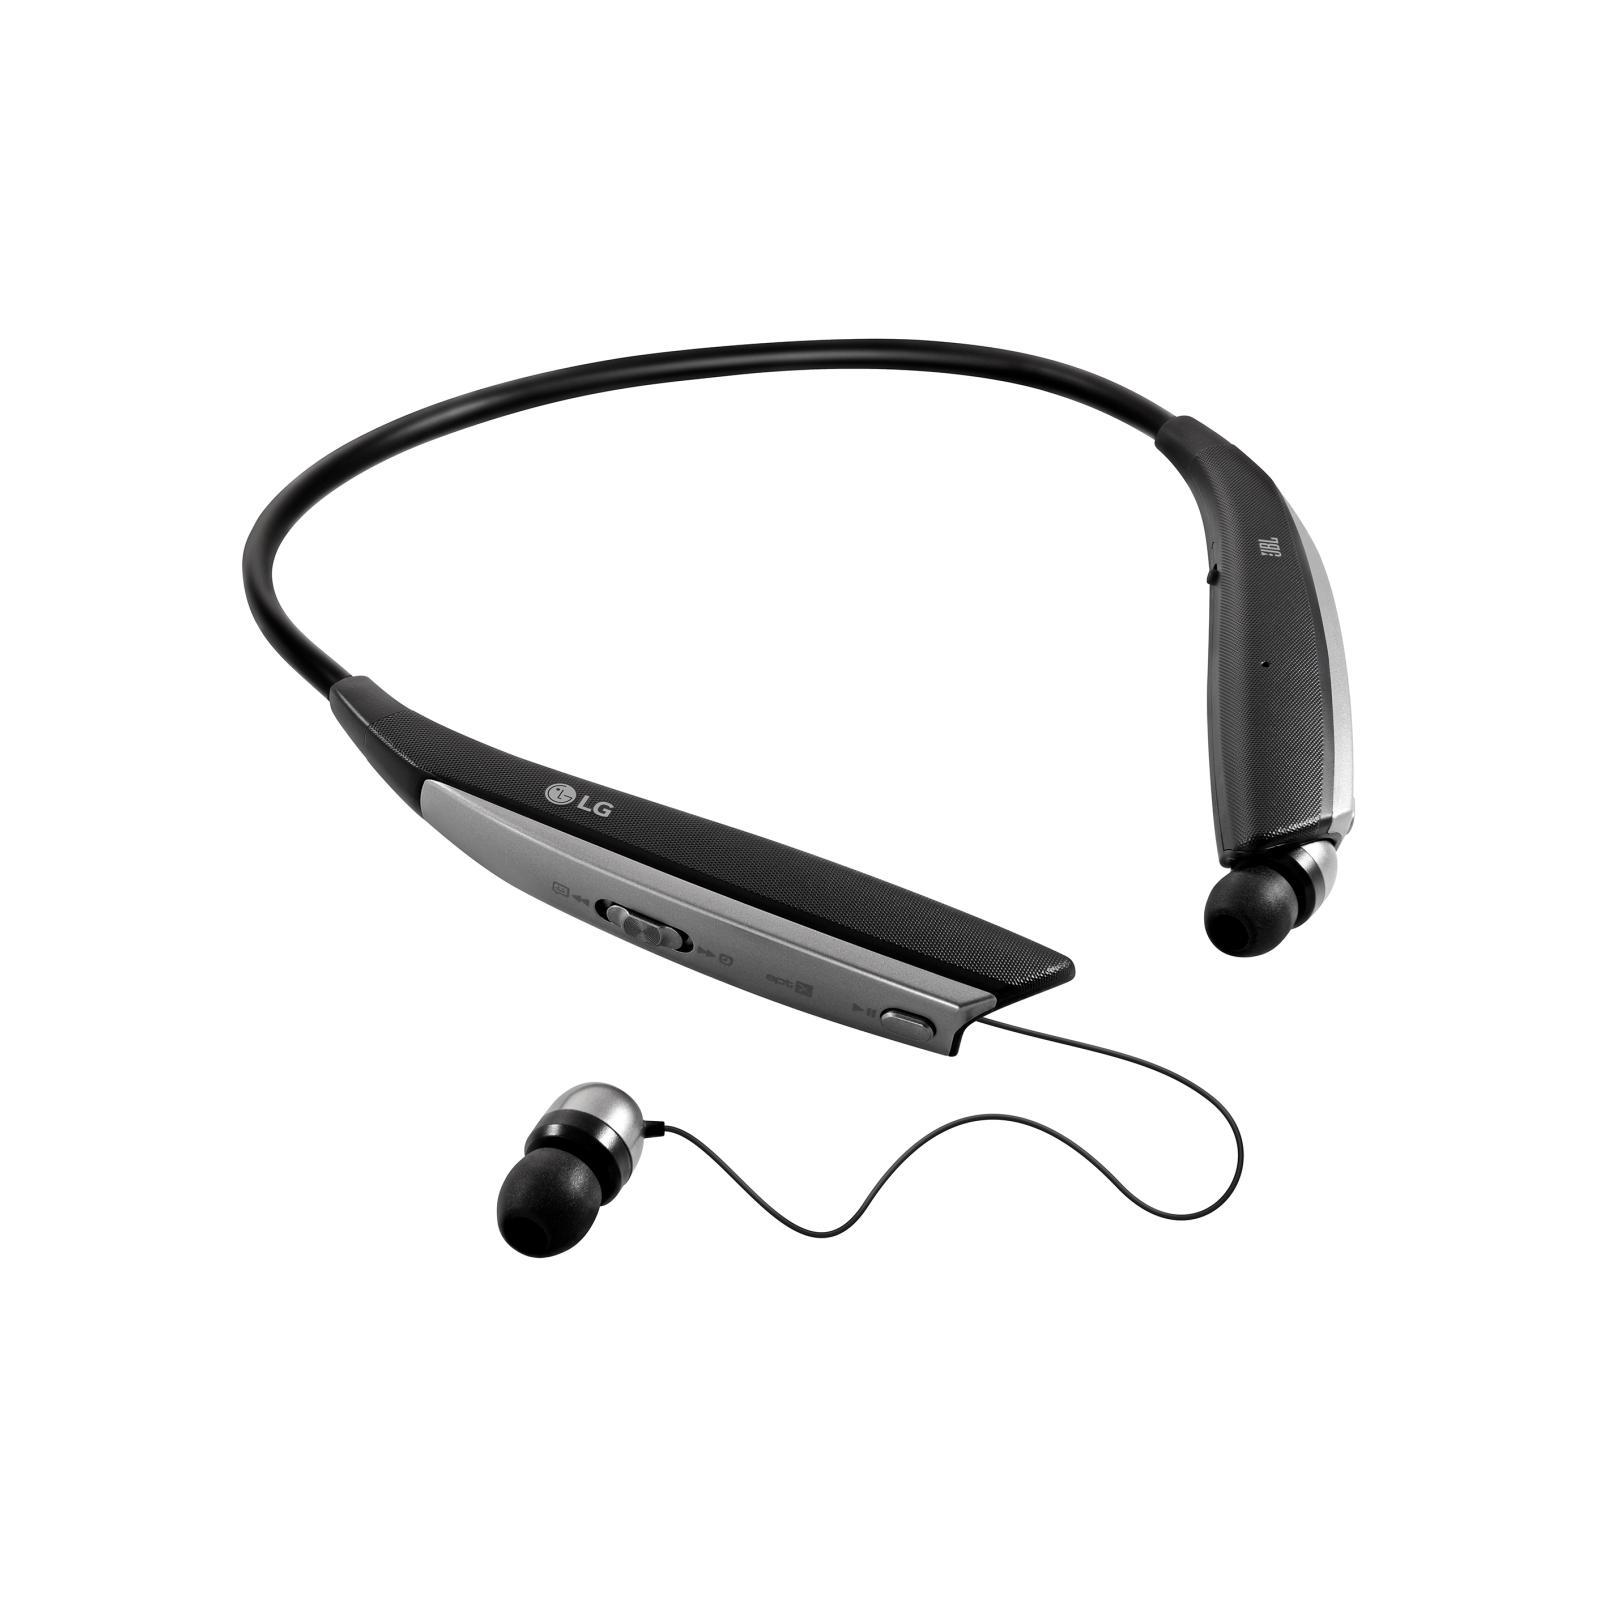 Lg Tone Ultra HBS-820 Headphone Bluetooth with microphone - Black